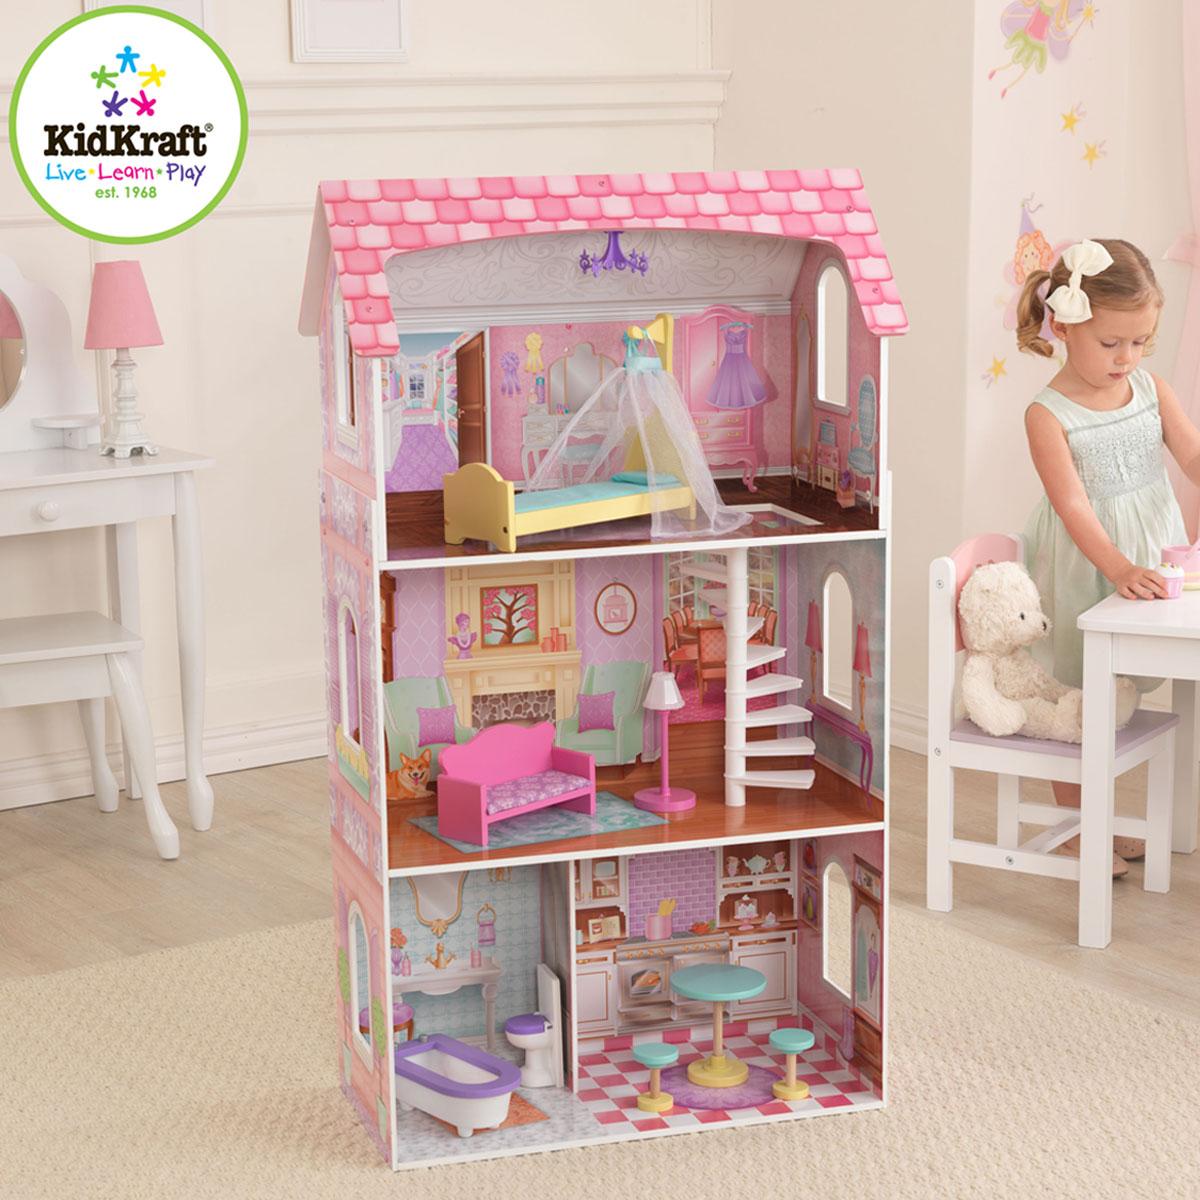 kidkraft puppenhaus penelope 65179 pirum holzspielzeuge. Black Bedroom Furniture Sets. Home Design Ideas